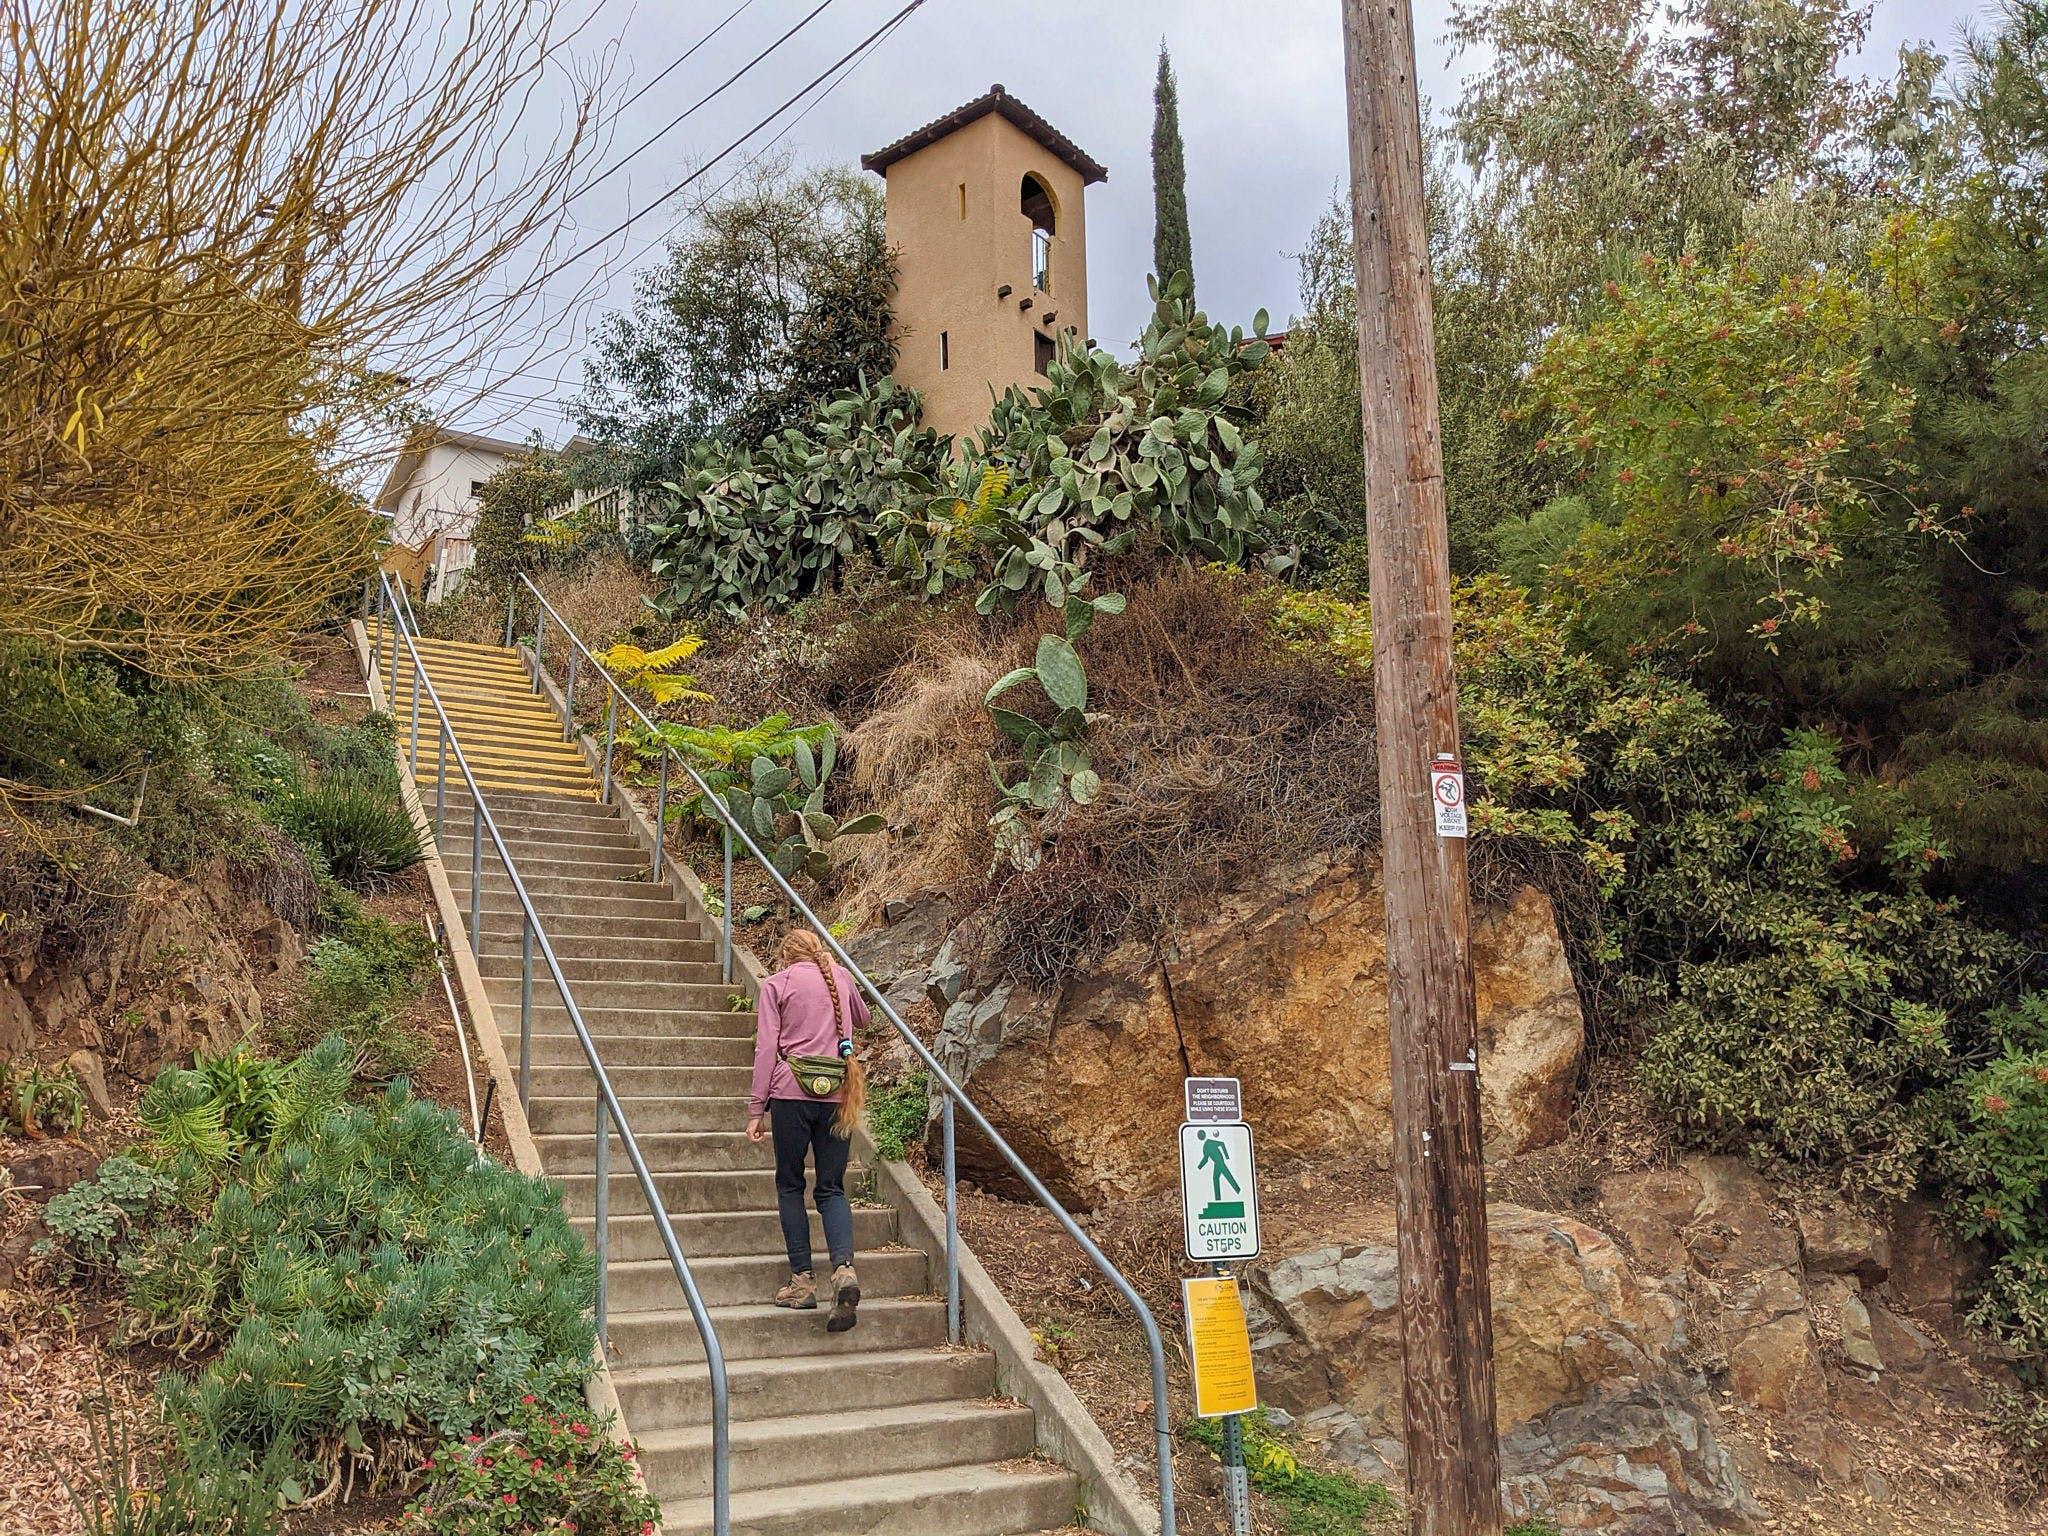 Woman walking up stairs in La Mesa San Diego